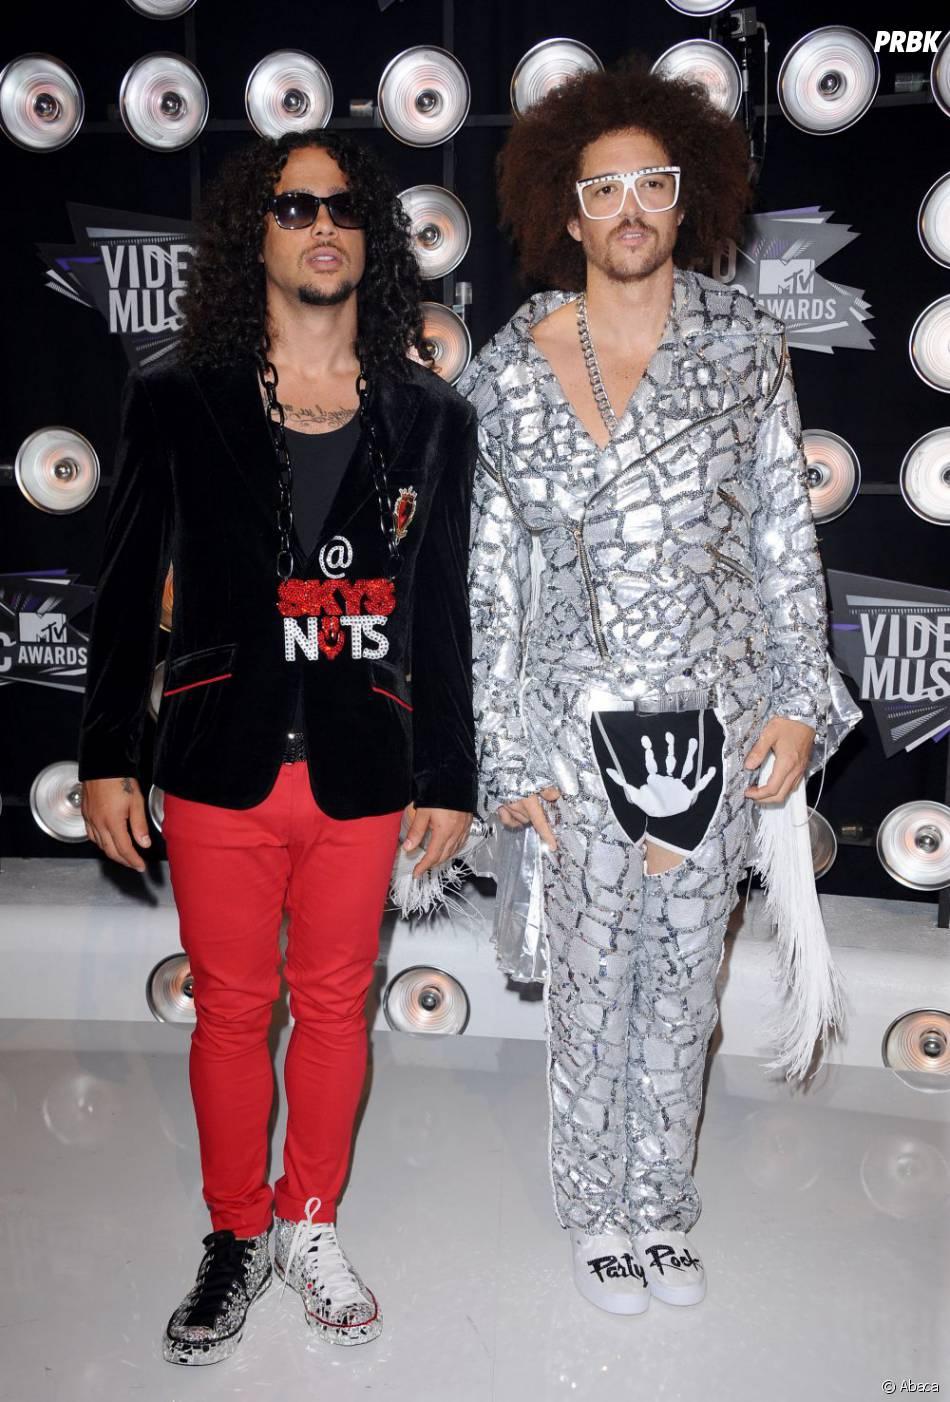 LMFAO aux MTV Video Music Awards 2011